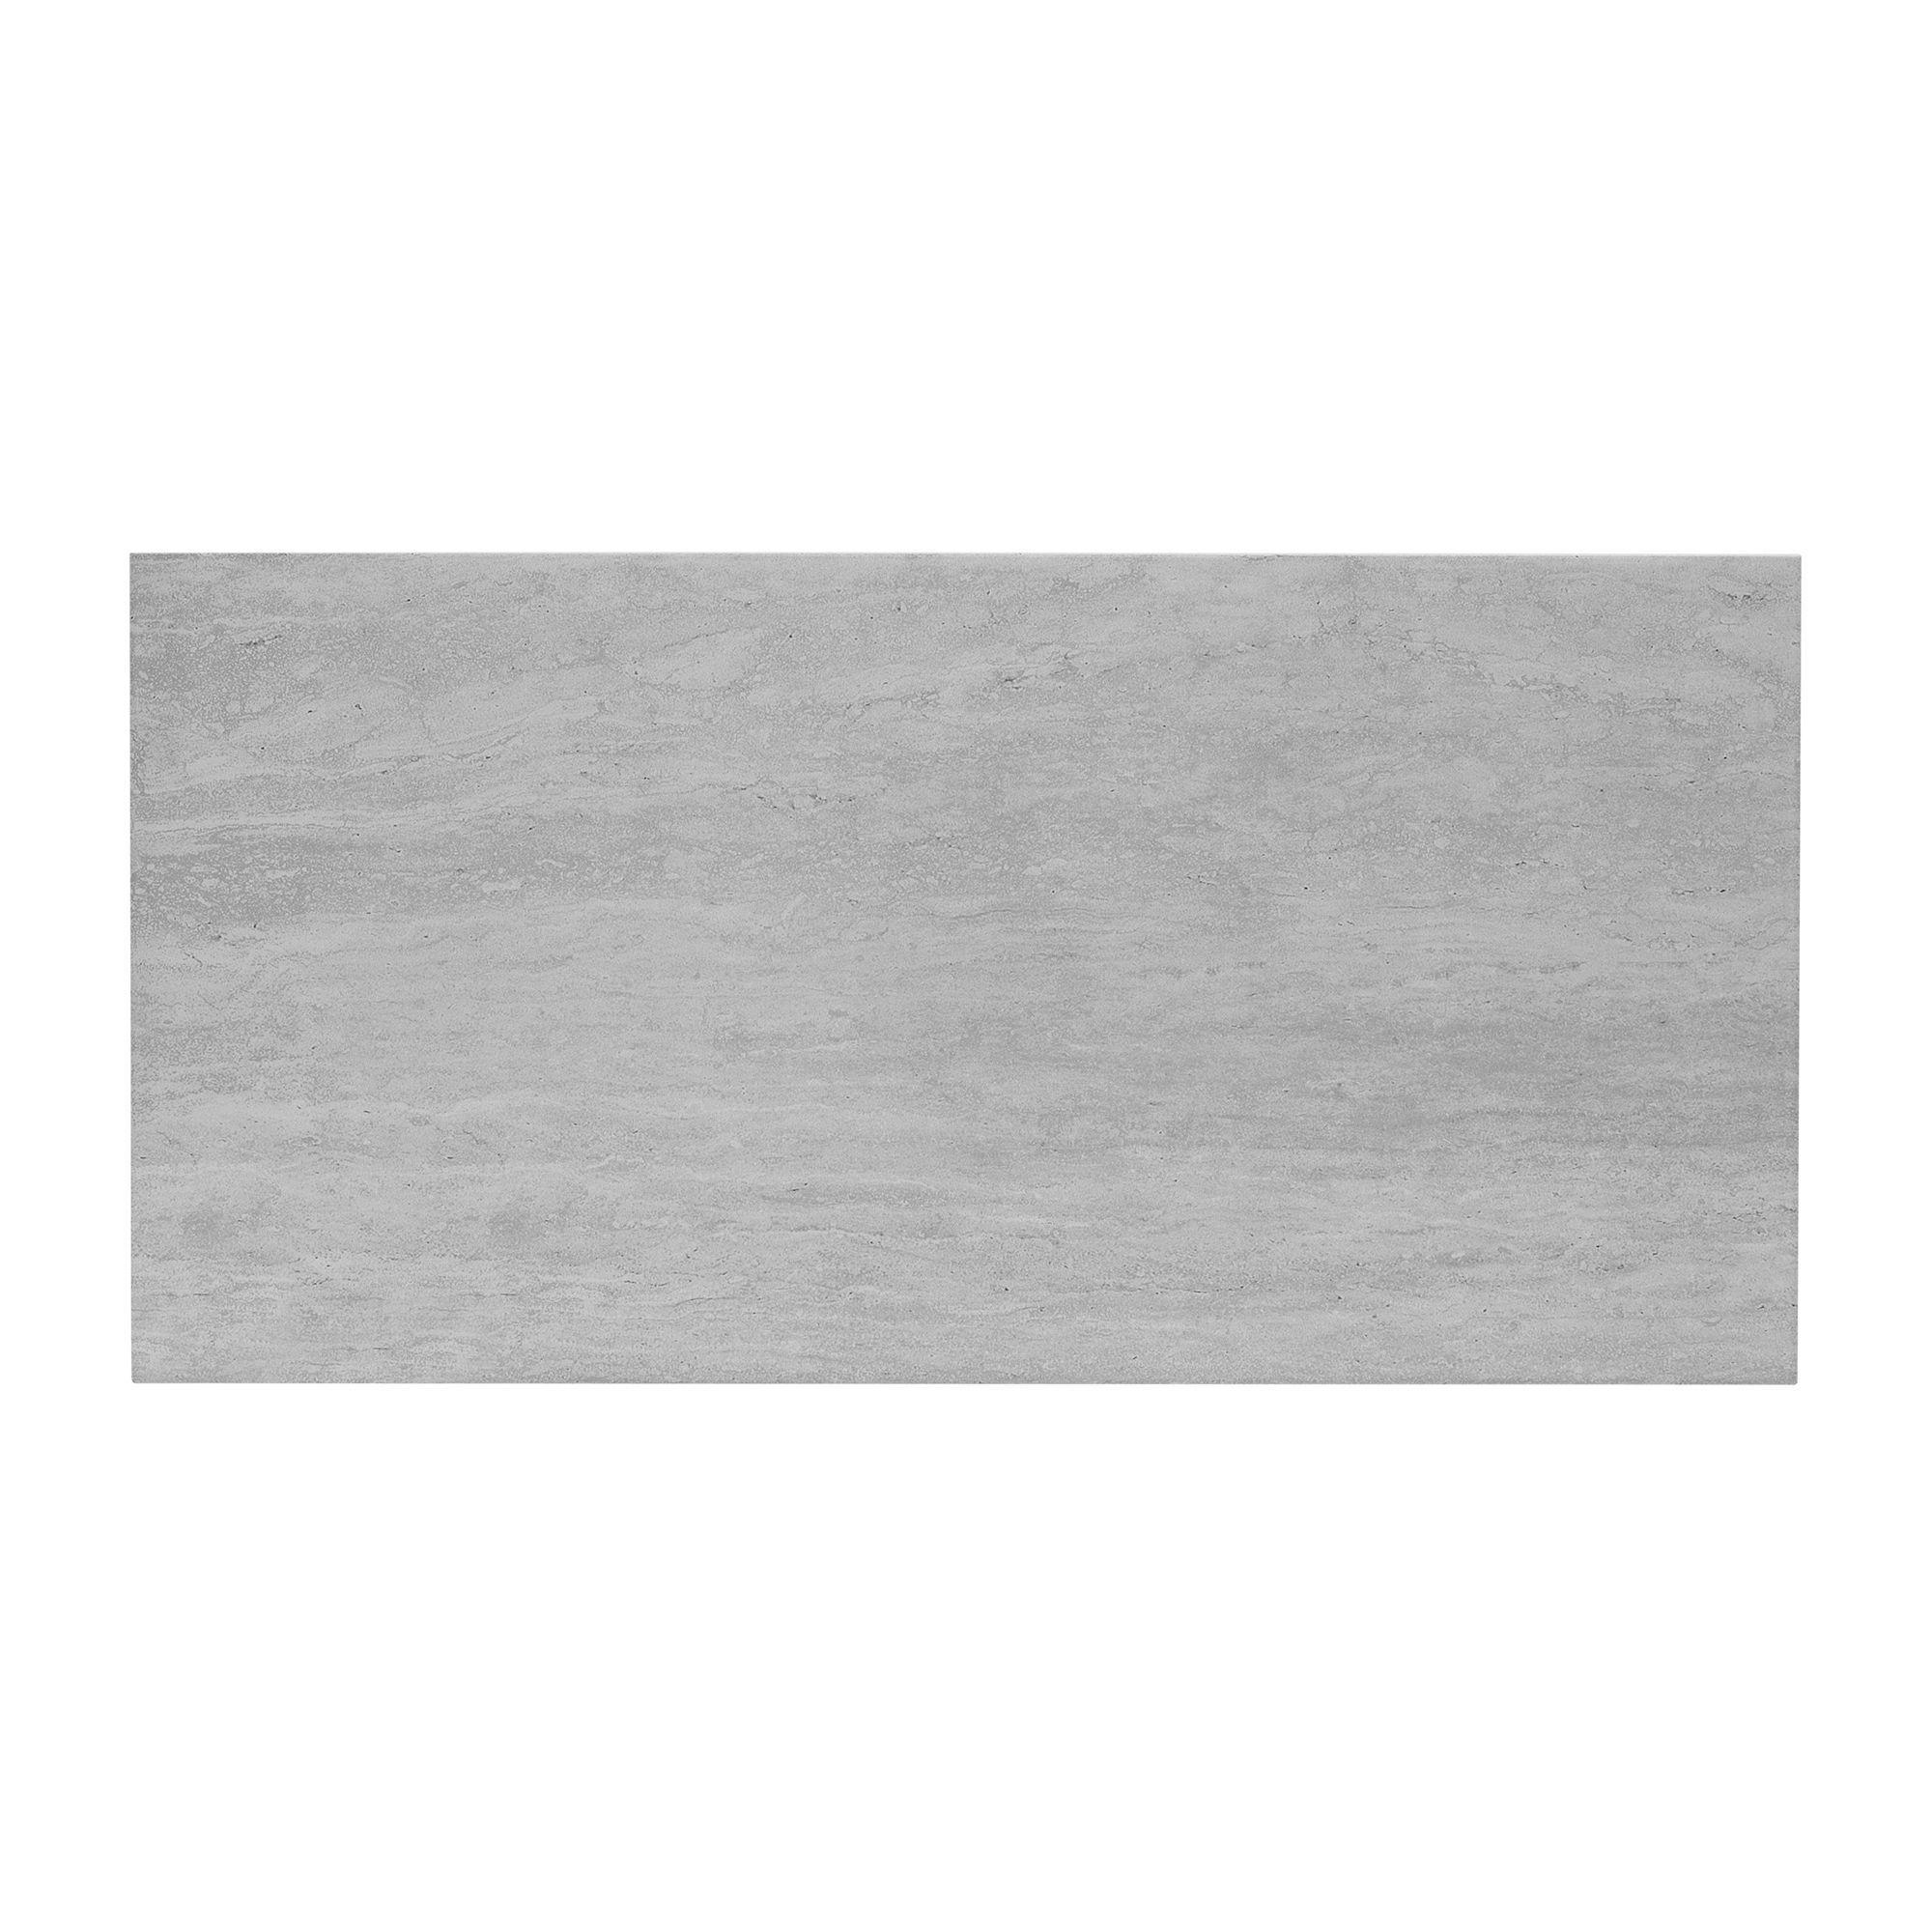 Bq Ceramic Kitchen Floor Tiles Origin Pebble Linear Travertine Ceramic Wall Tile Pack Of 8 L